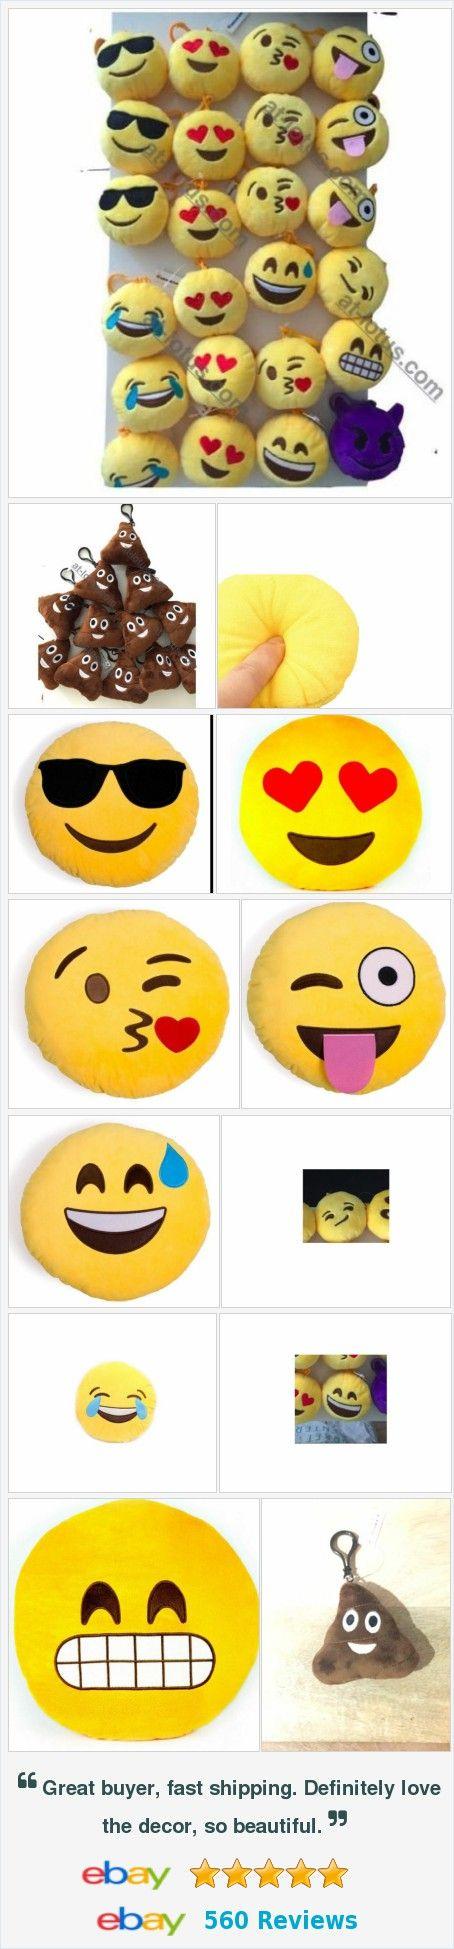 "Emoji Poop Smiley Face emoticon 3"" Plush clip-on keychain backpack accessory http://www.ebay.com/itm/Emoji-Poop-Smiley-Face-emoticon-3-Plush-clip-on-keychain-backpack-accessory-/182062889956?rd=1"